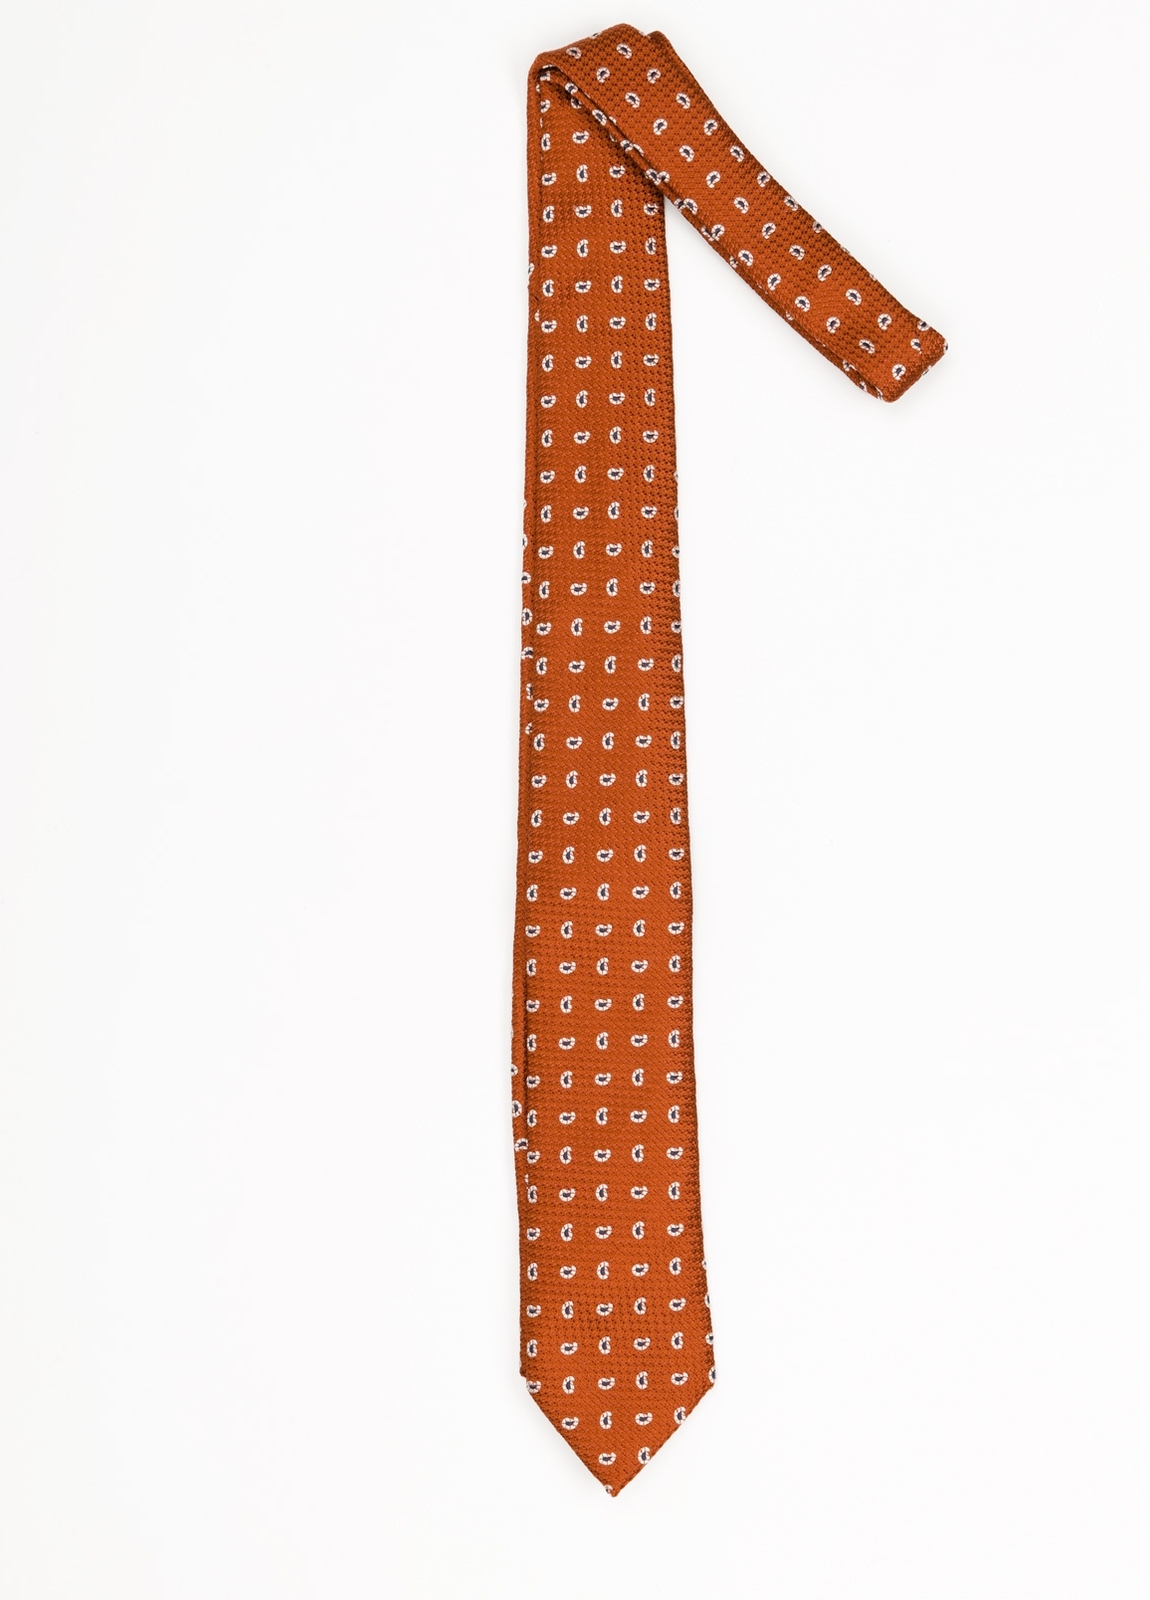 Corbata Formal Wear microdibujo, color naranja. Pala 7,5 cm. 100% SedFo